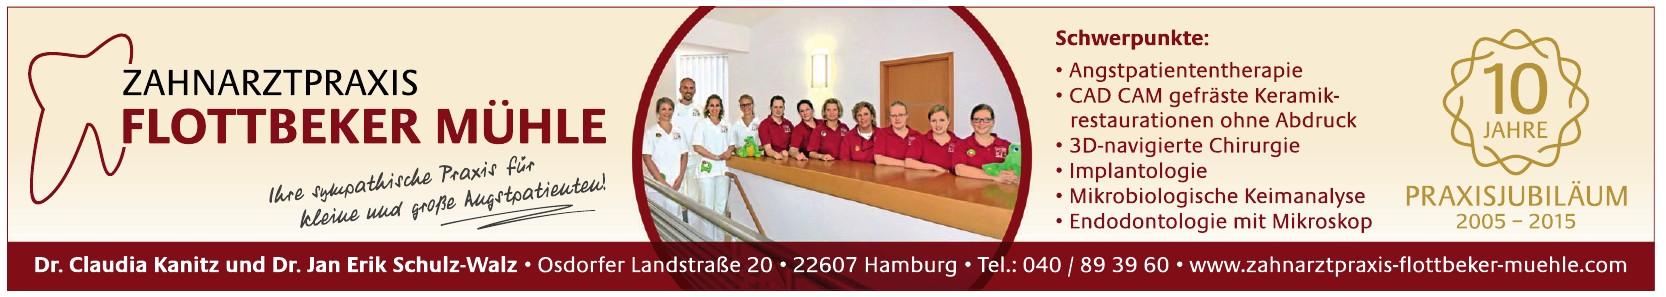 Zahnarztpraxis Flottbeker Mühle, Dr. Claudia Kanitz und Dr. Jan Erik Schulz-Walz